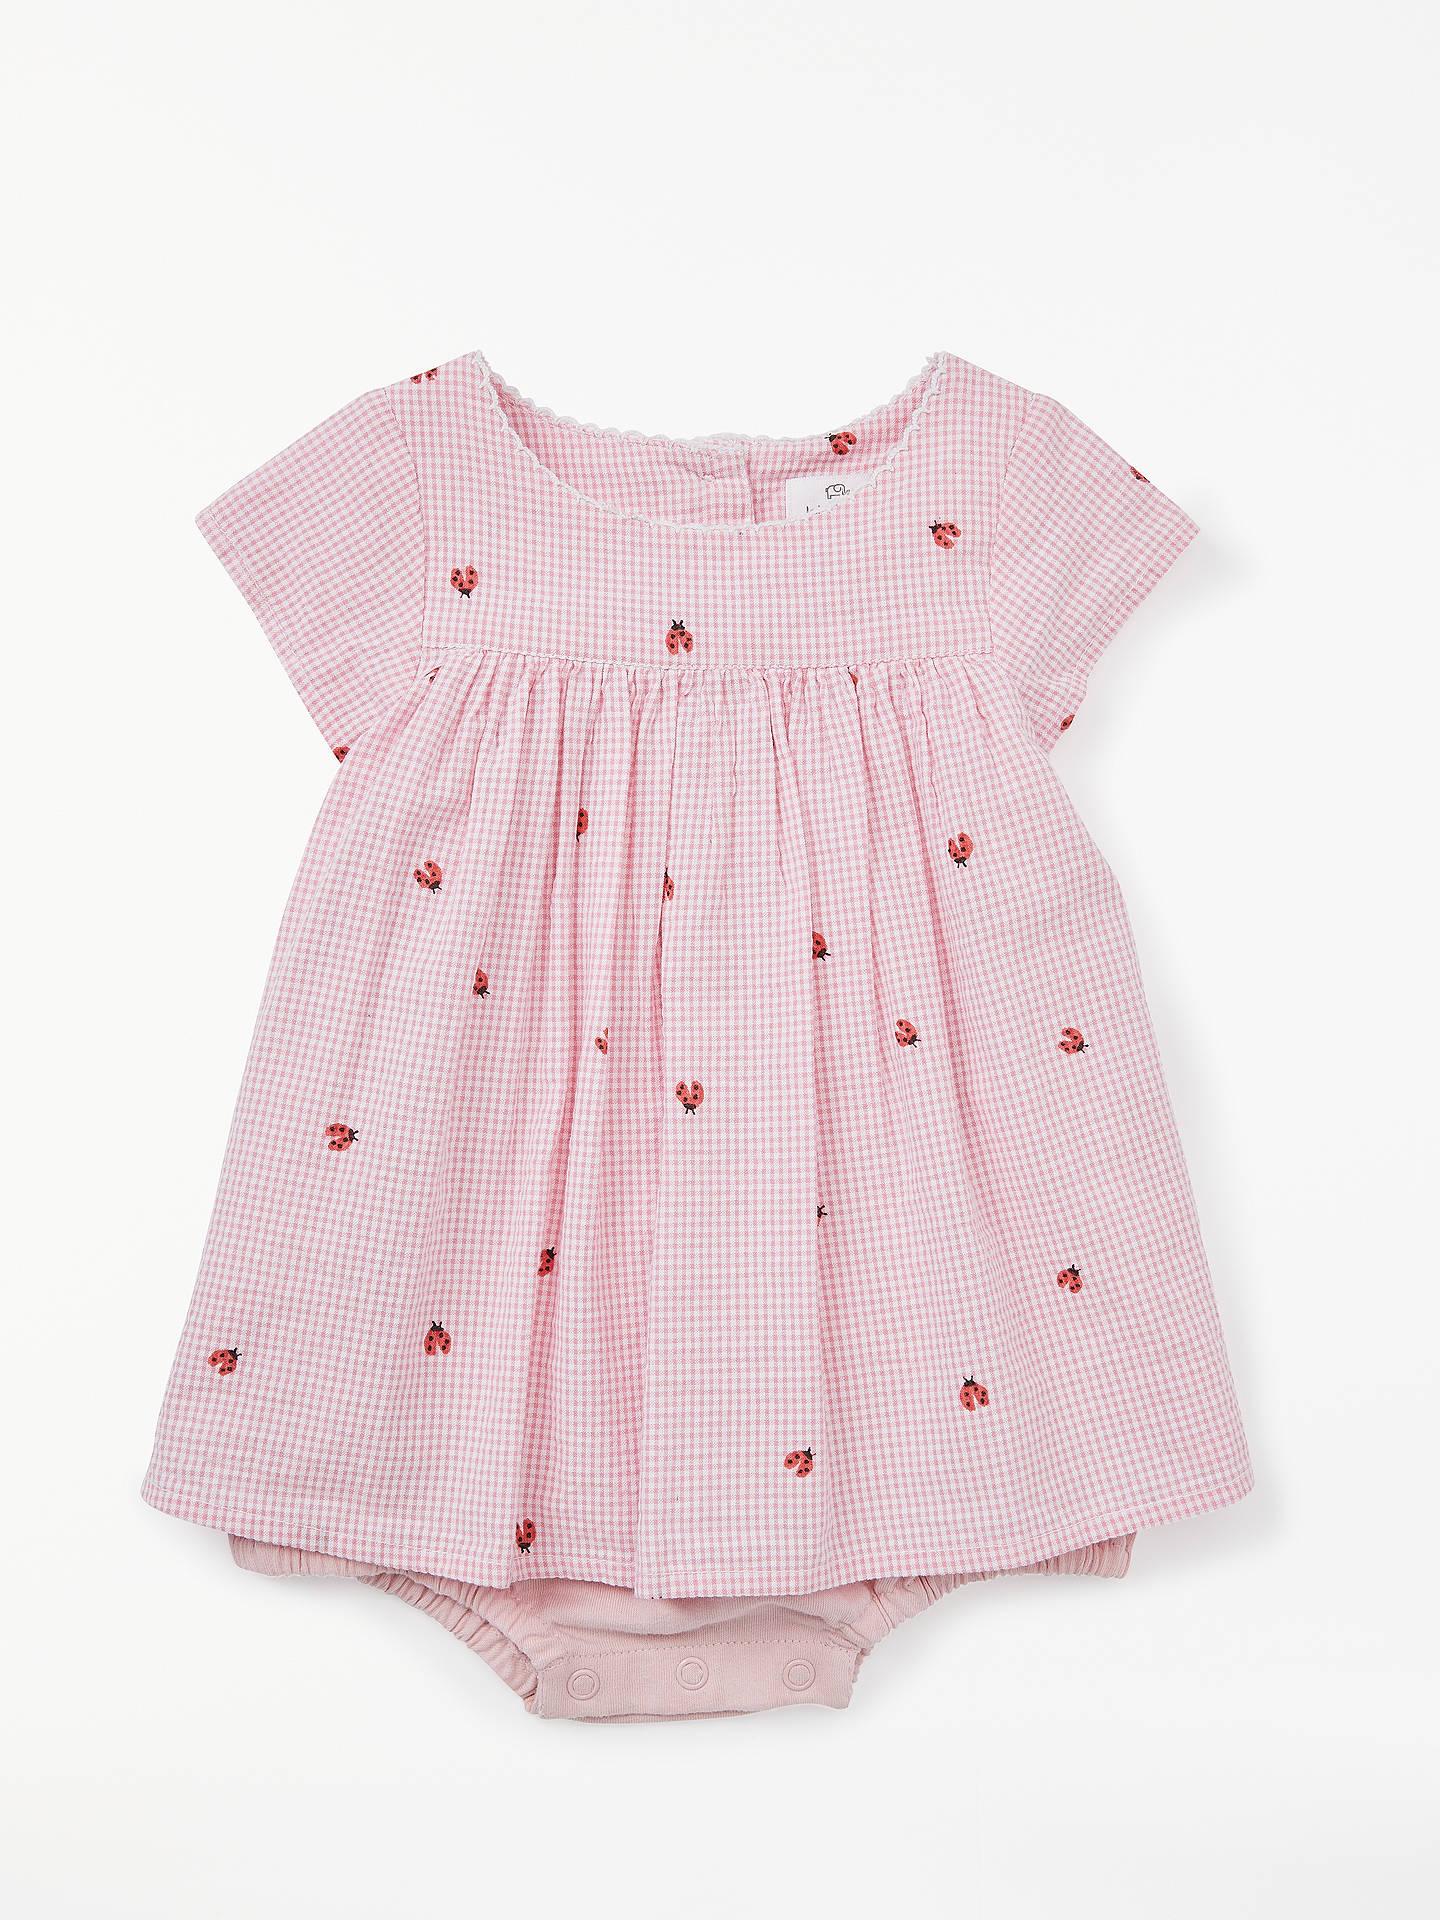 7e4e3fe6f John Lewis   Partners Baby Ladybird Gingham Dress and Bodsyuit Set ...